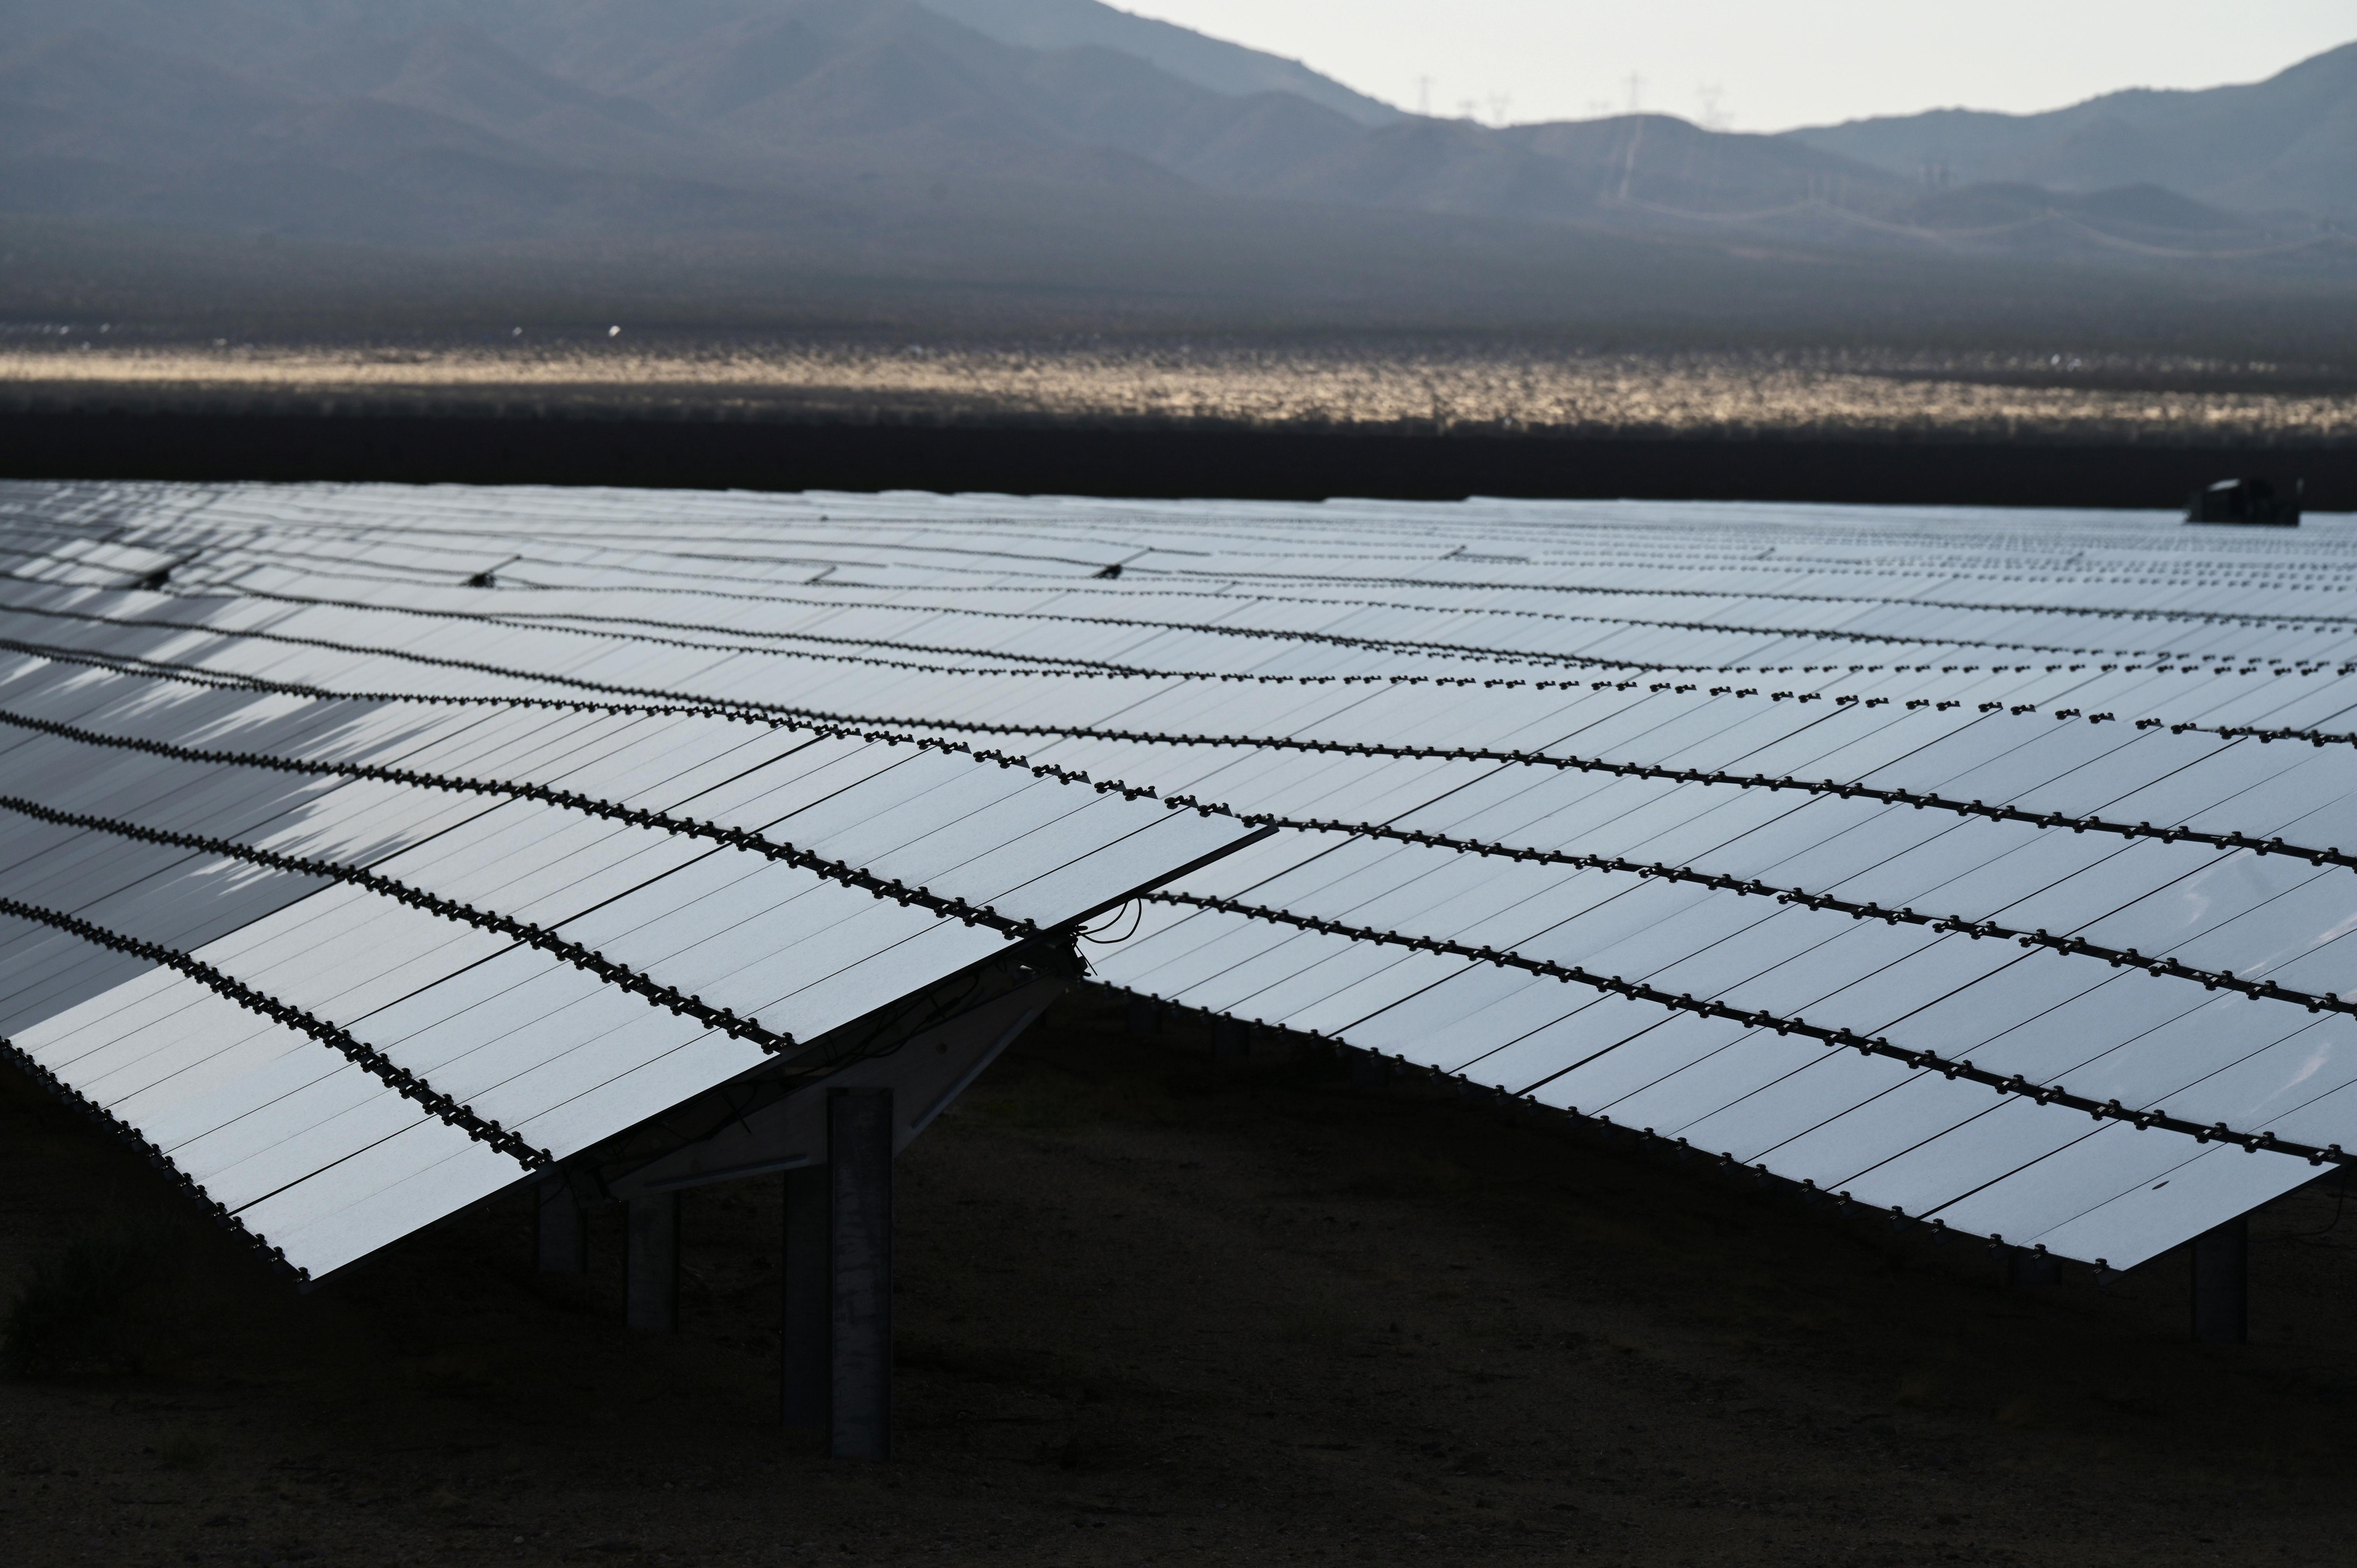 Gwelir paneli solar ym mhrosiect Desert Stateline ger Nipton, California, UD Awst 16, 2021. REUTERS / Bridget Bennett